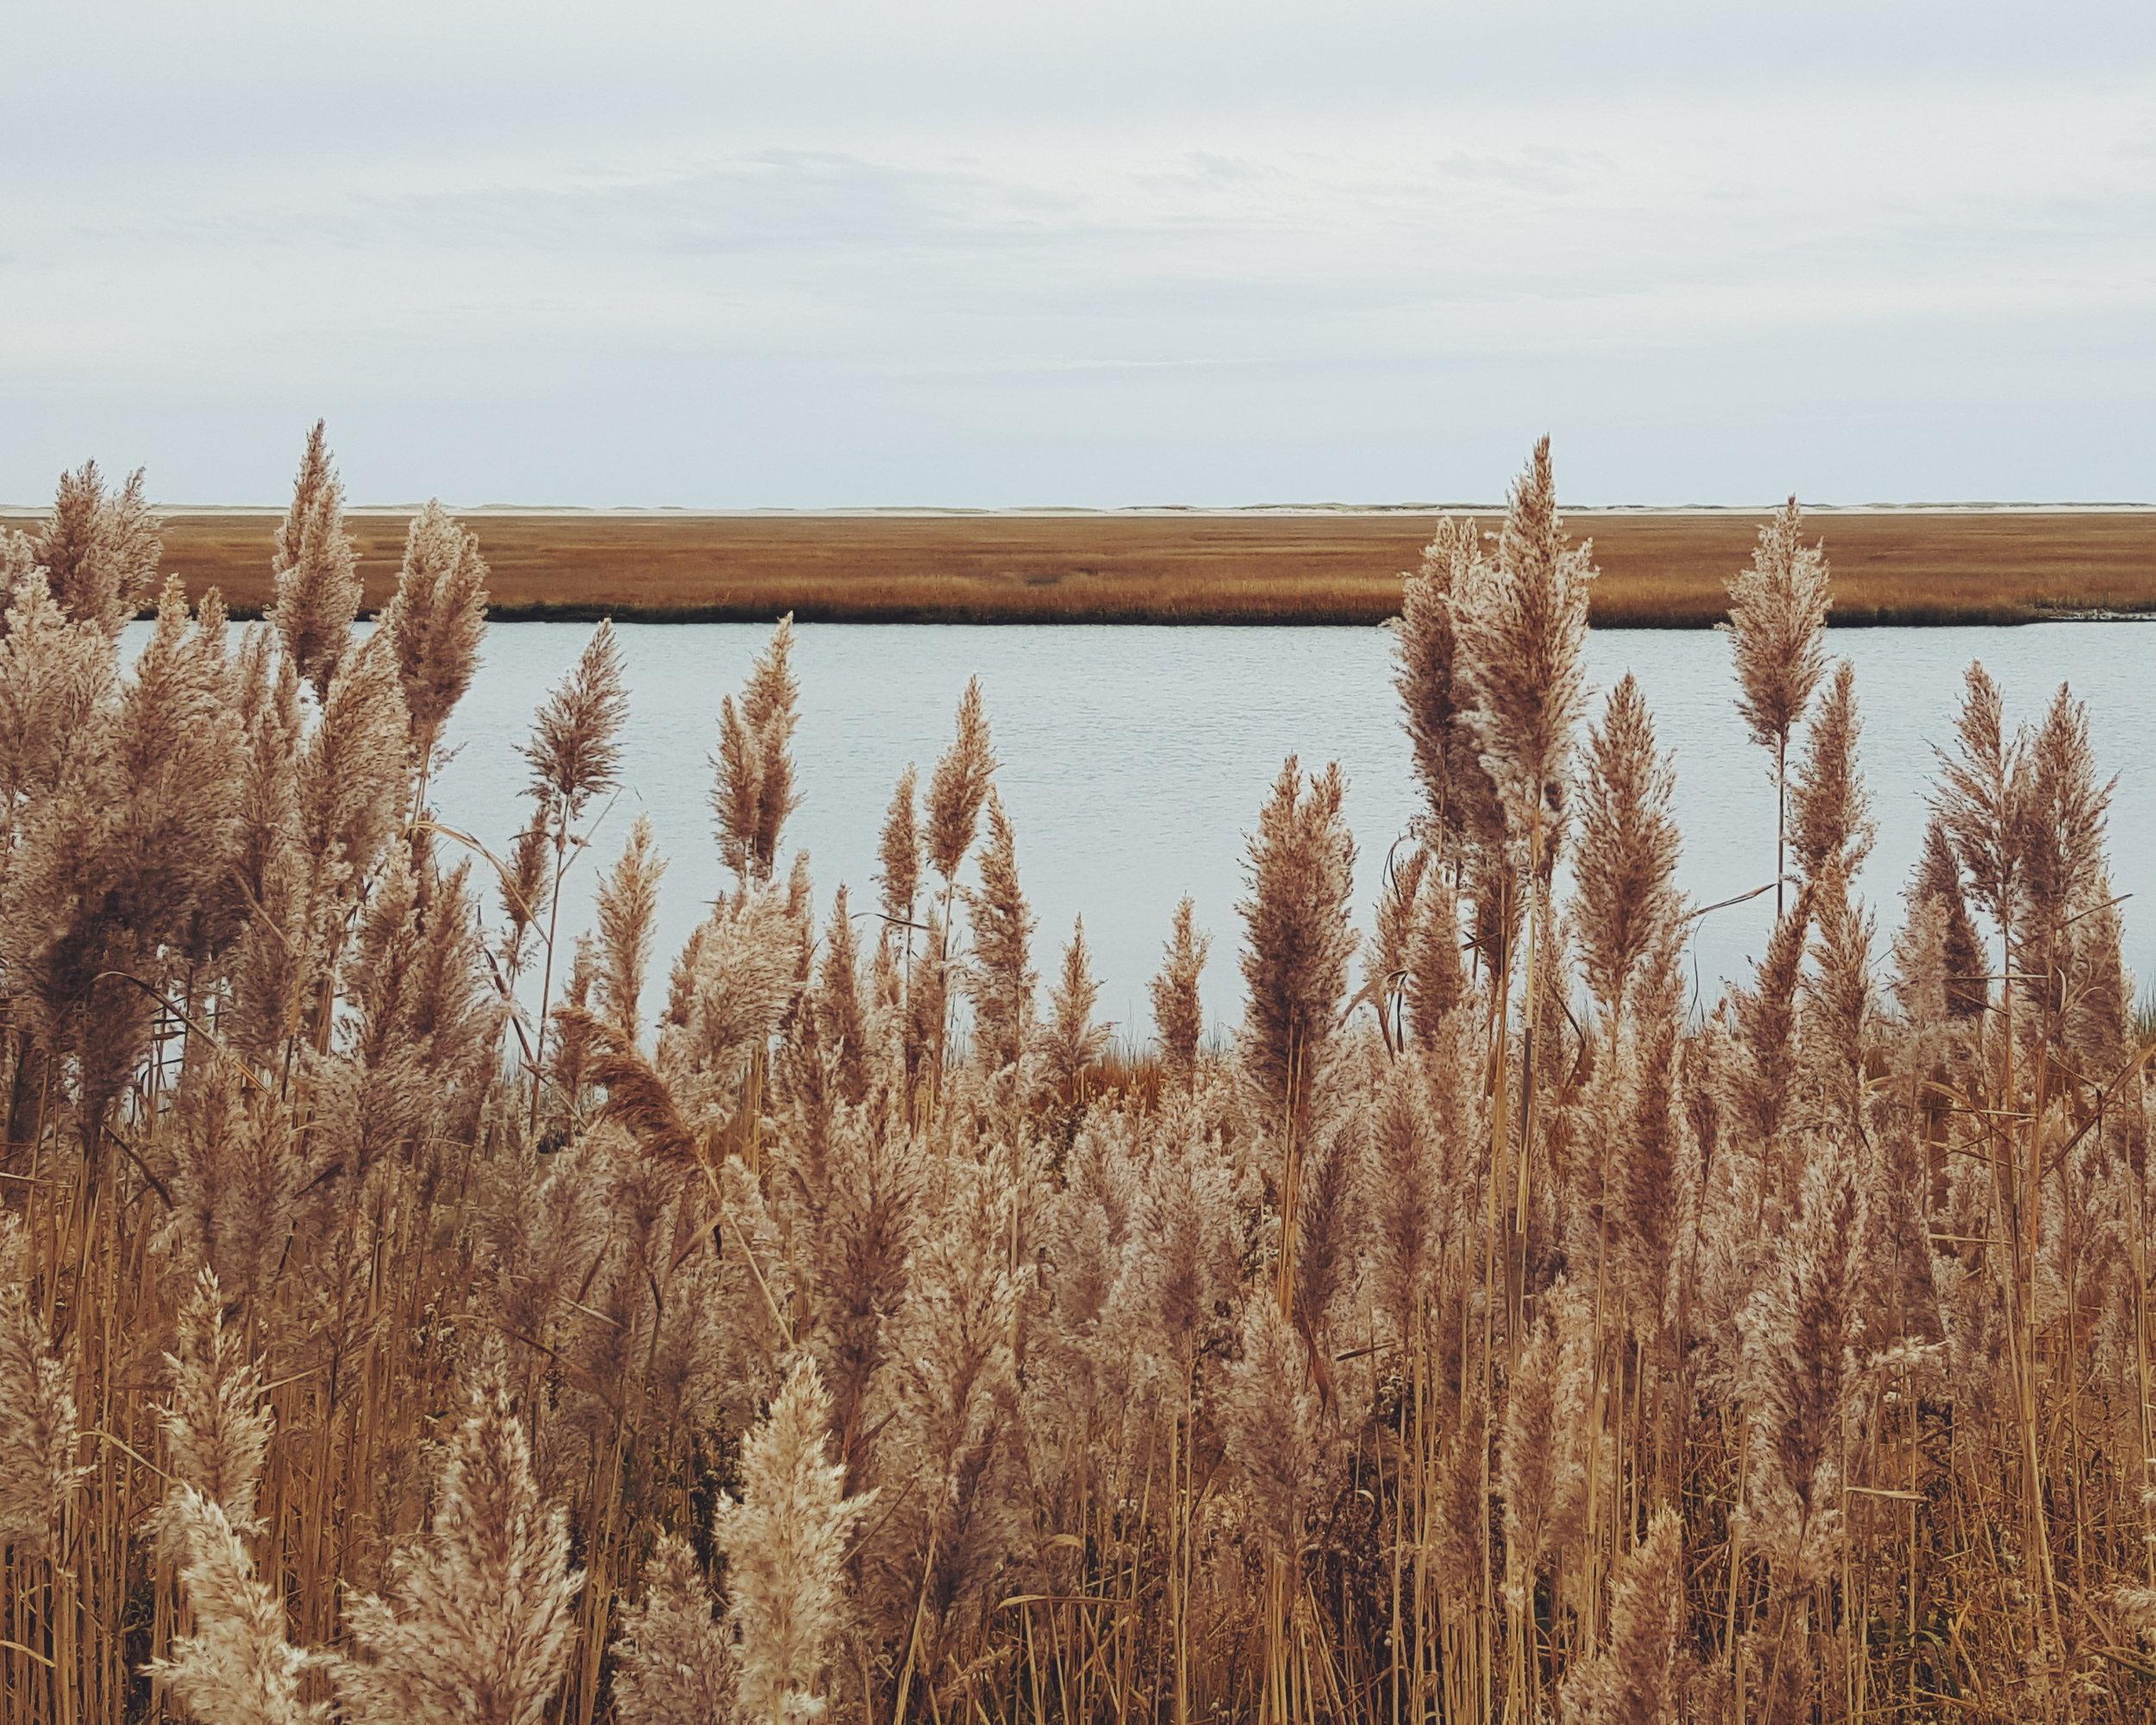 Cape Cod National Seashore in Eastham.